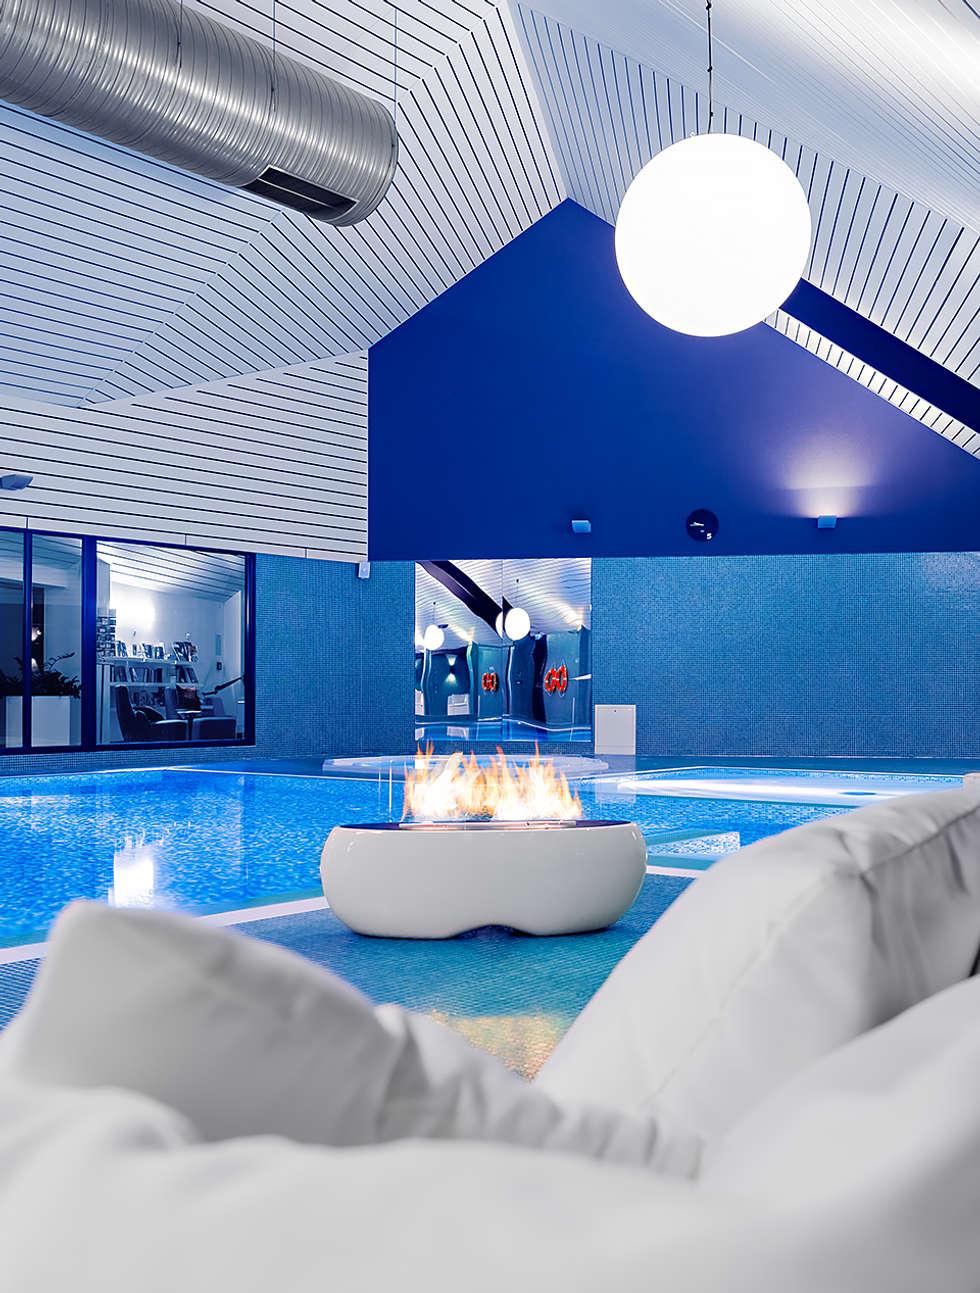 Interior design ideas architecture and renovating photos for Pool design company radom polen